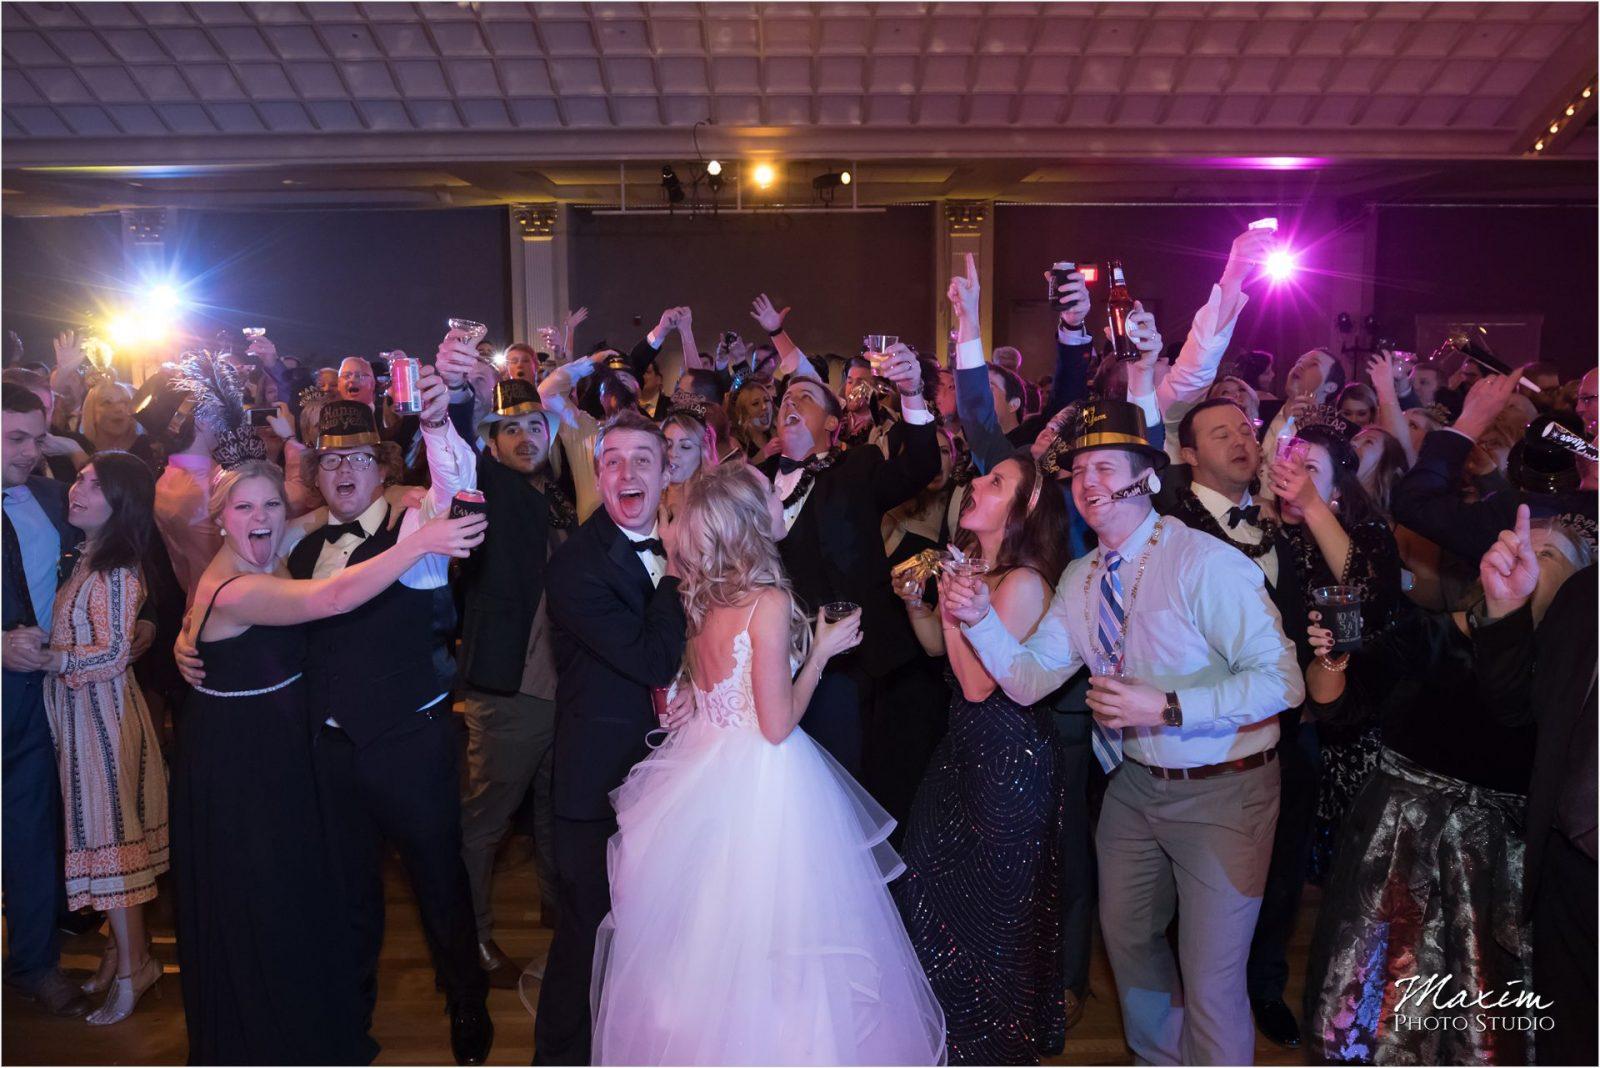 Cincinnati Music Hall Ballroom Wedding Reception Dance Balloon drop